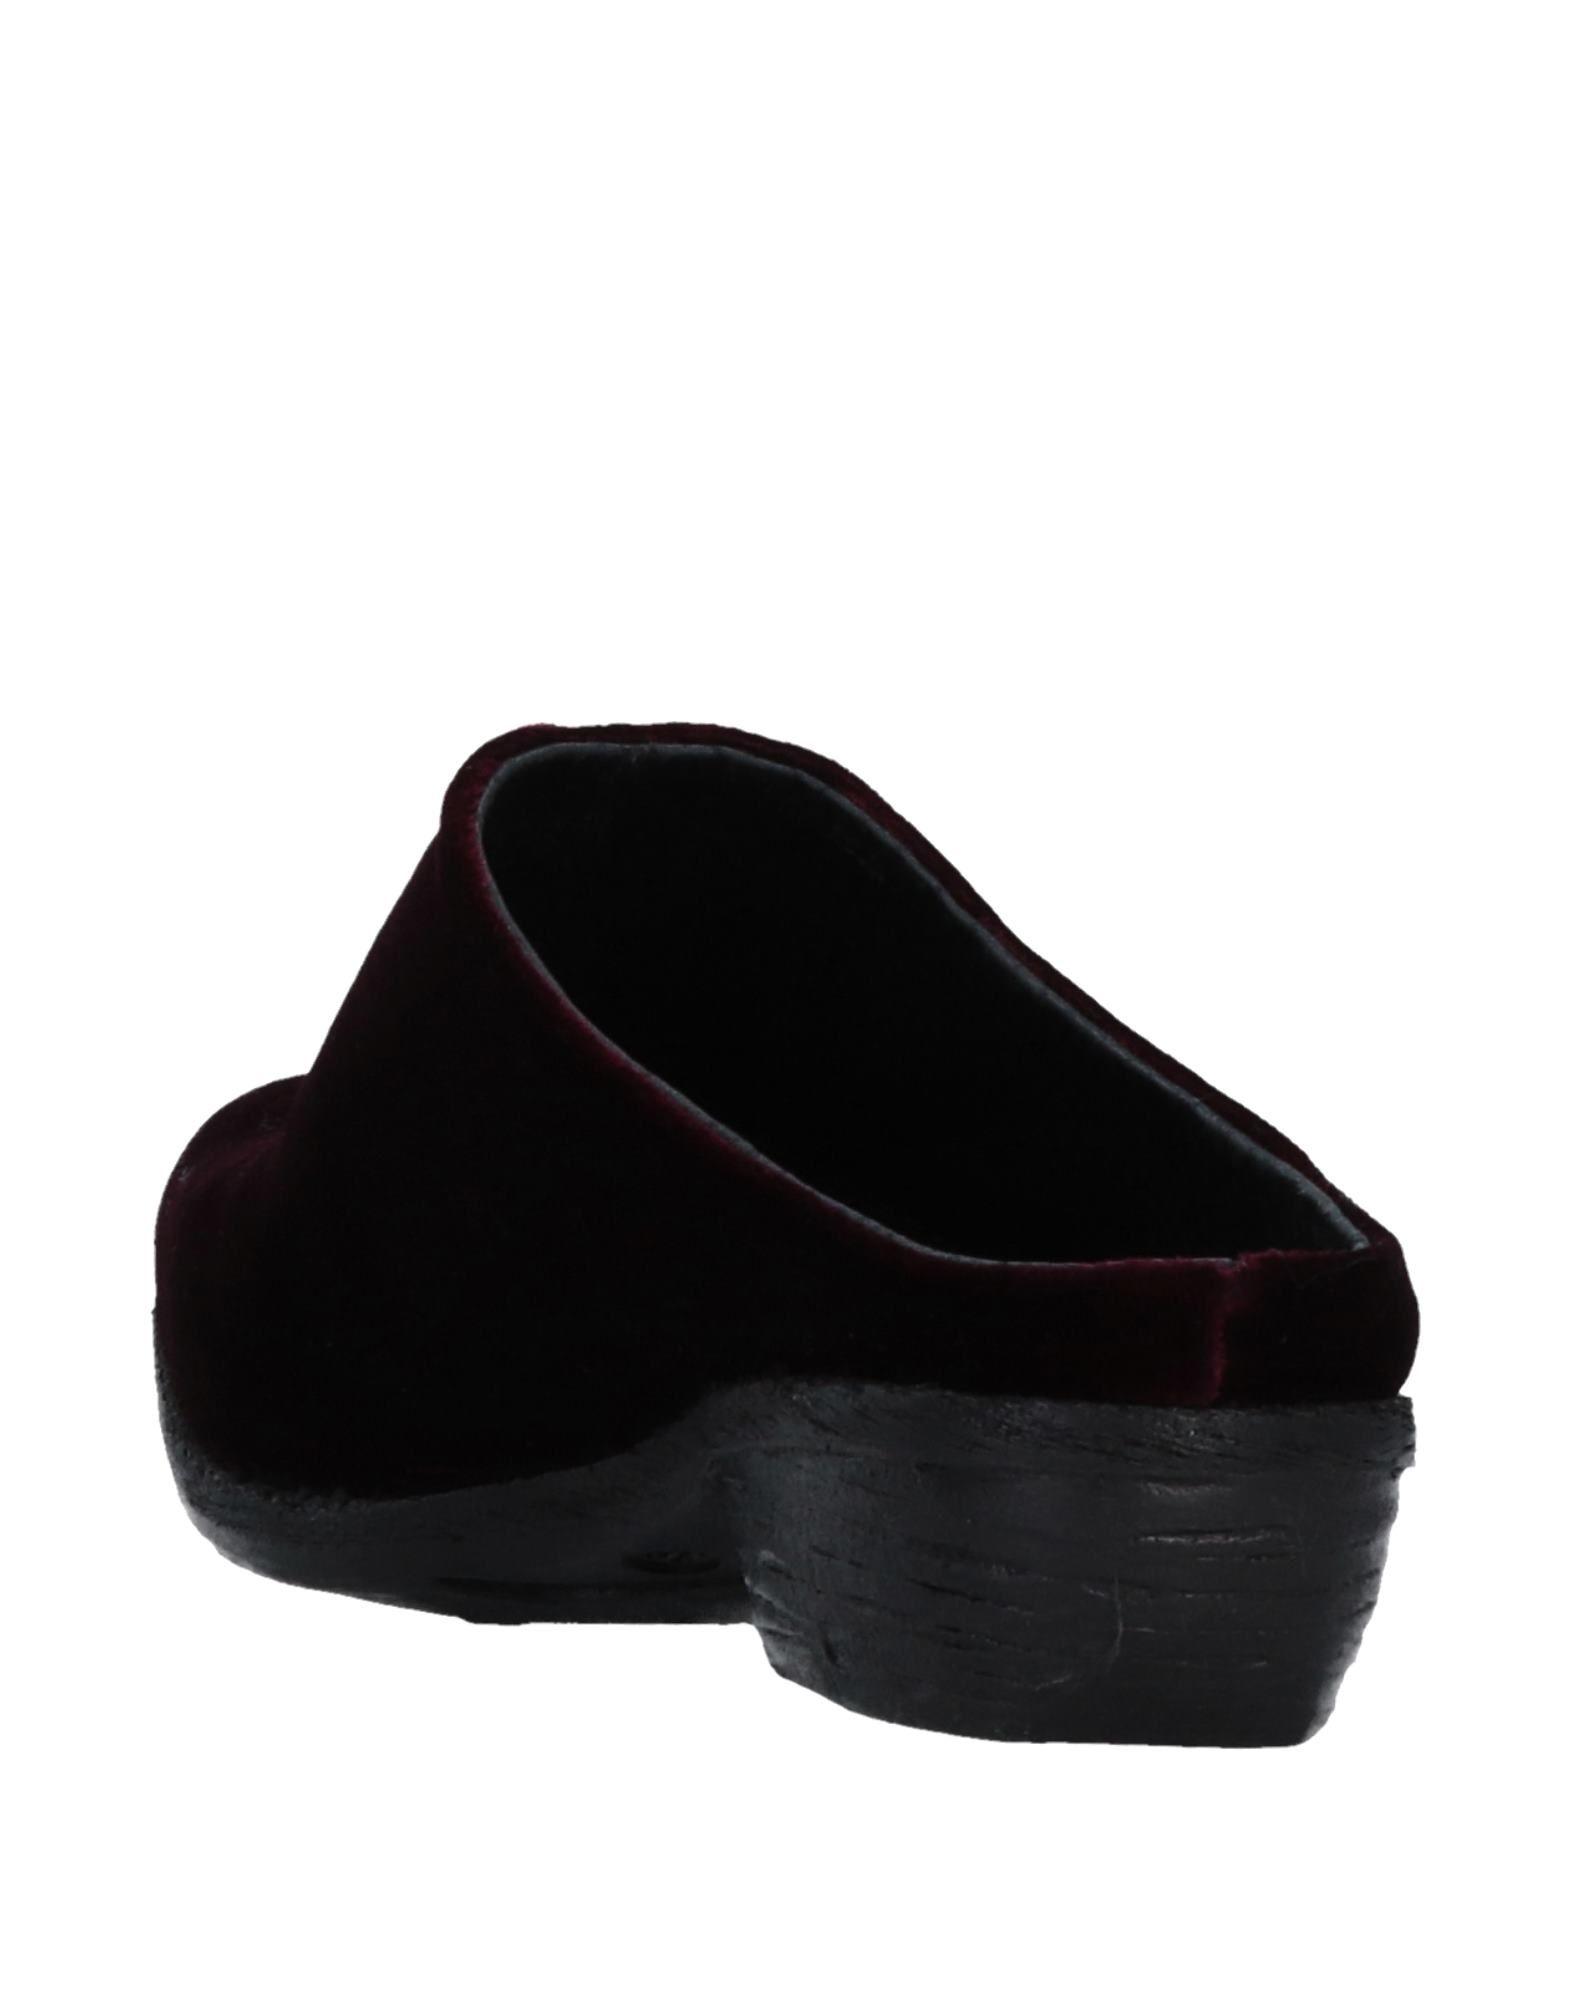 Stilvolle billige Schuhe Damen Rock Rodeo Pantoletten Damen Schuhe  11507121GX abf535